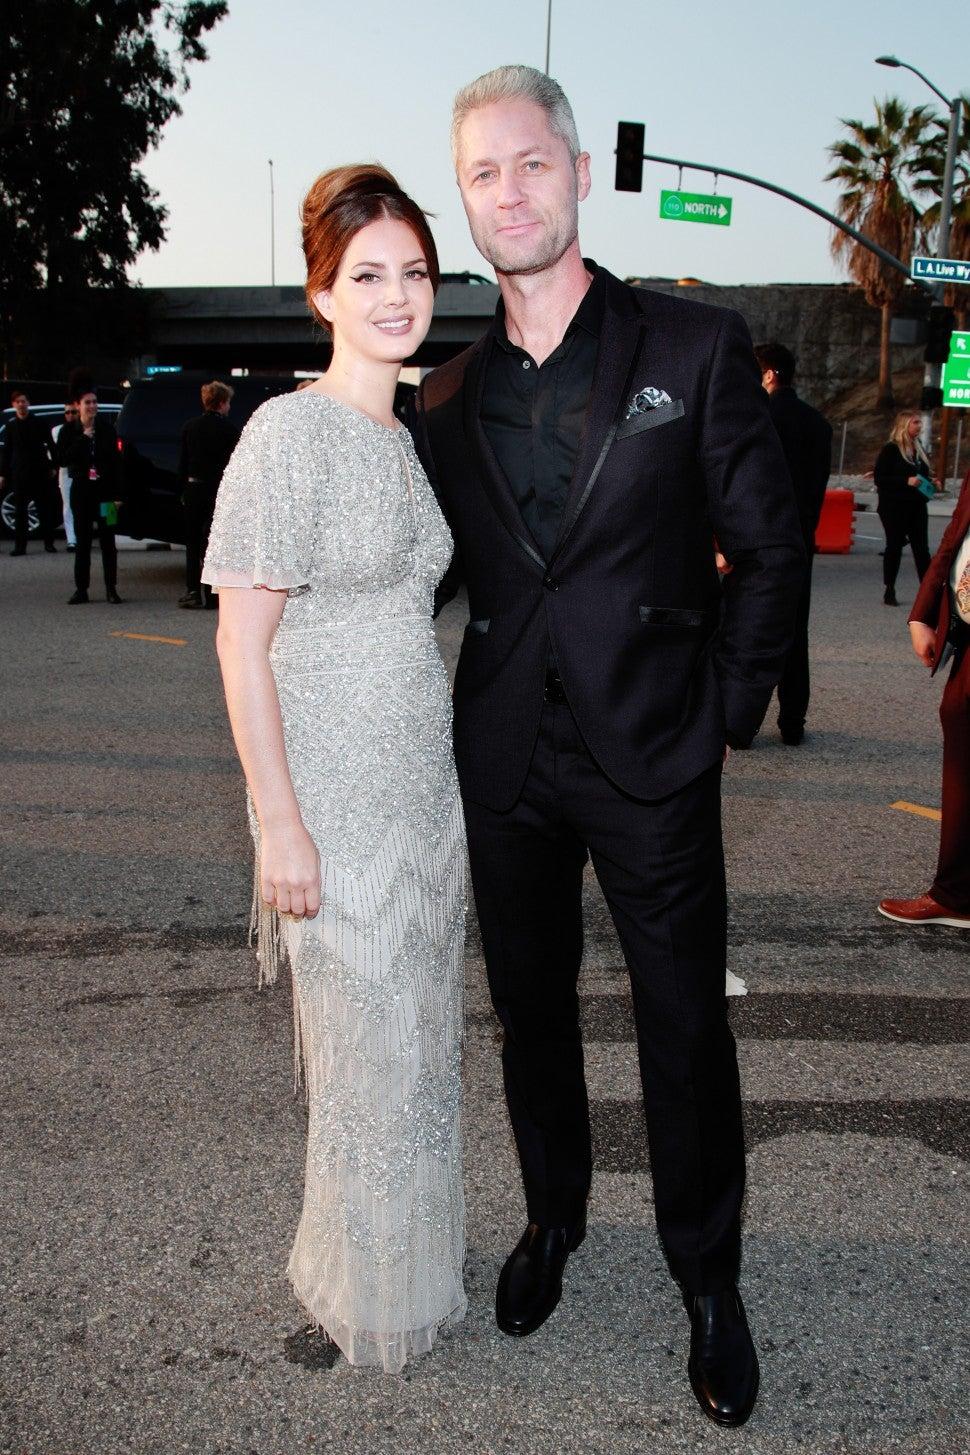 Lana Del Rey Makes Grammys Red Carpet Debut With Boyfriend Sean Larkin Entertainment Tonight